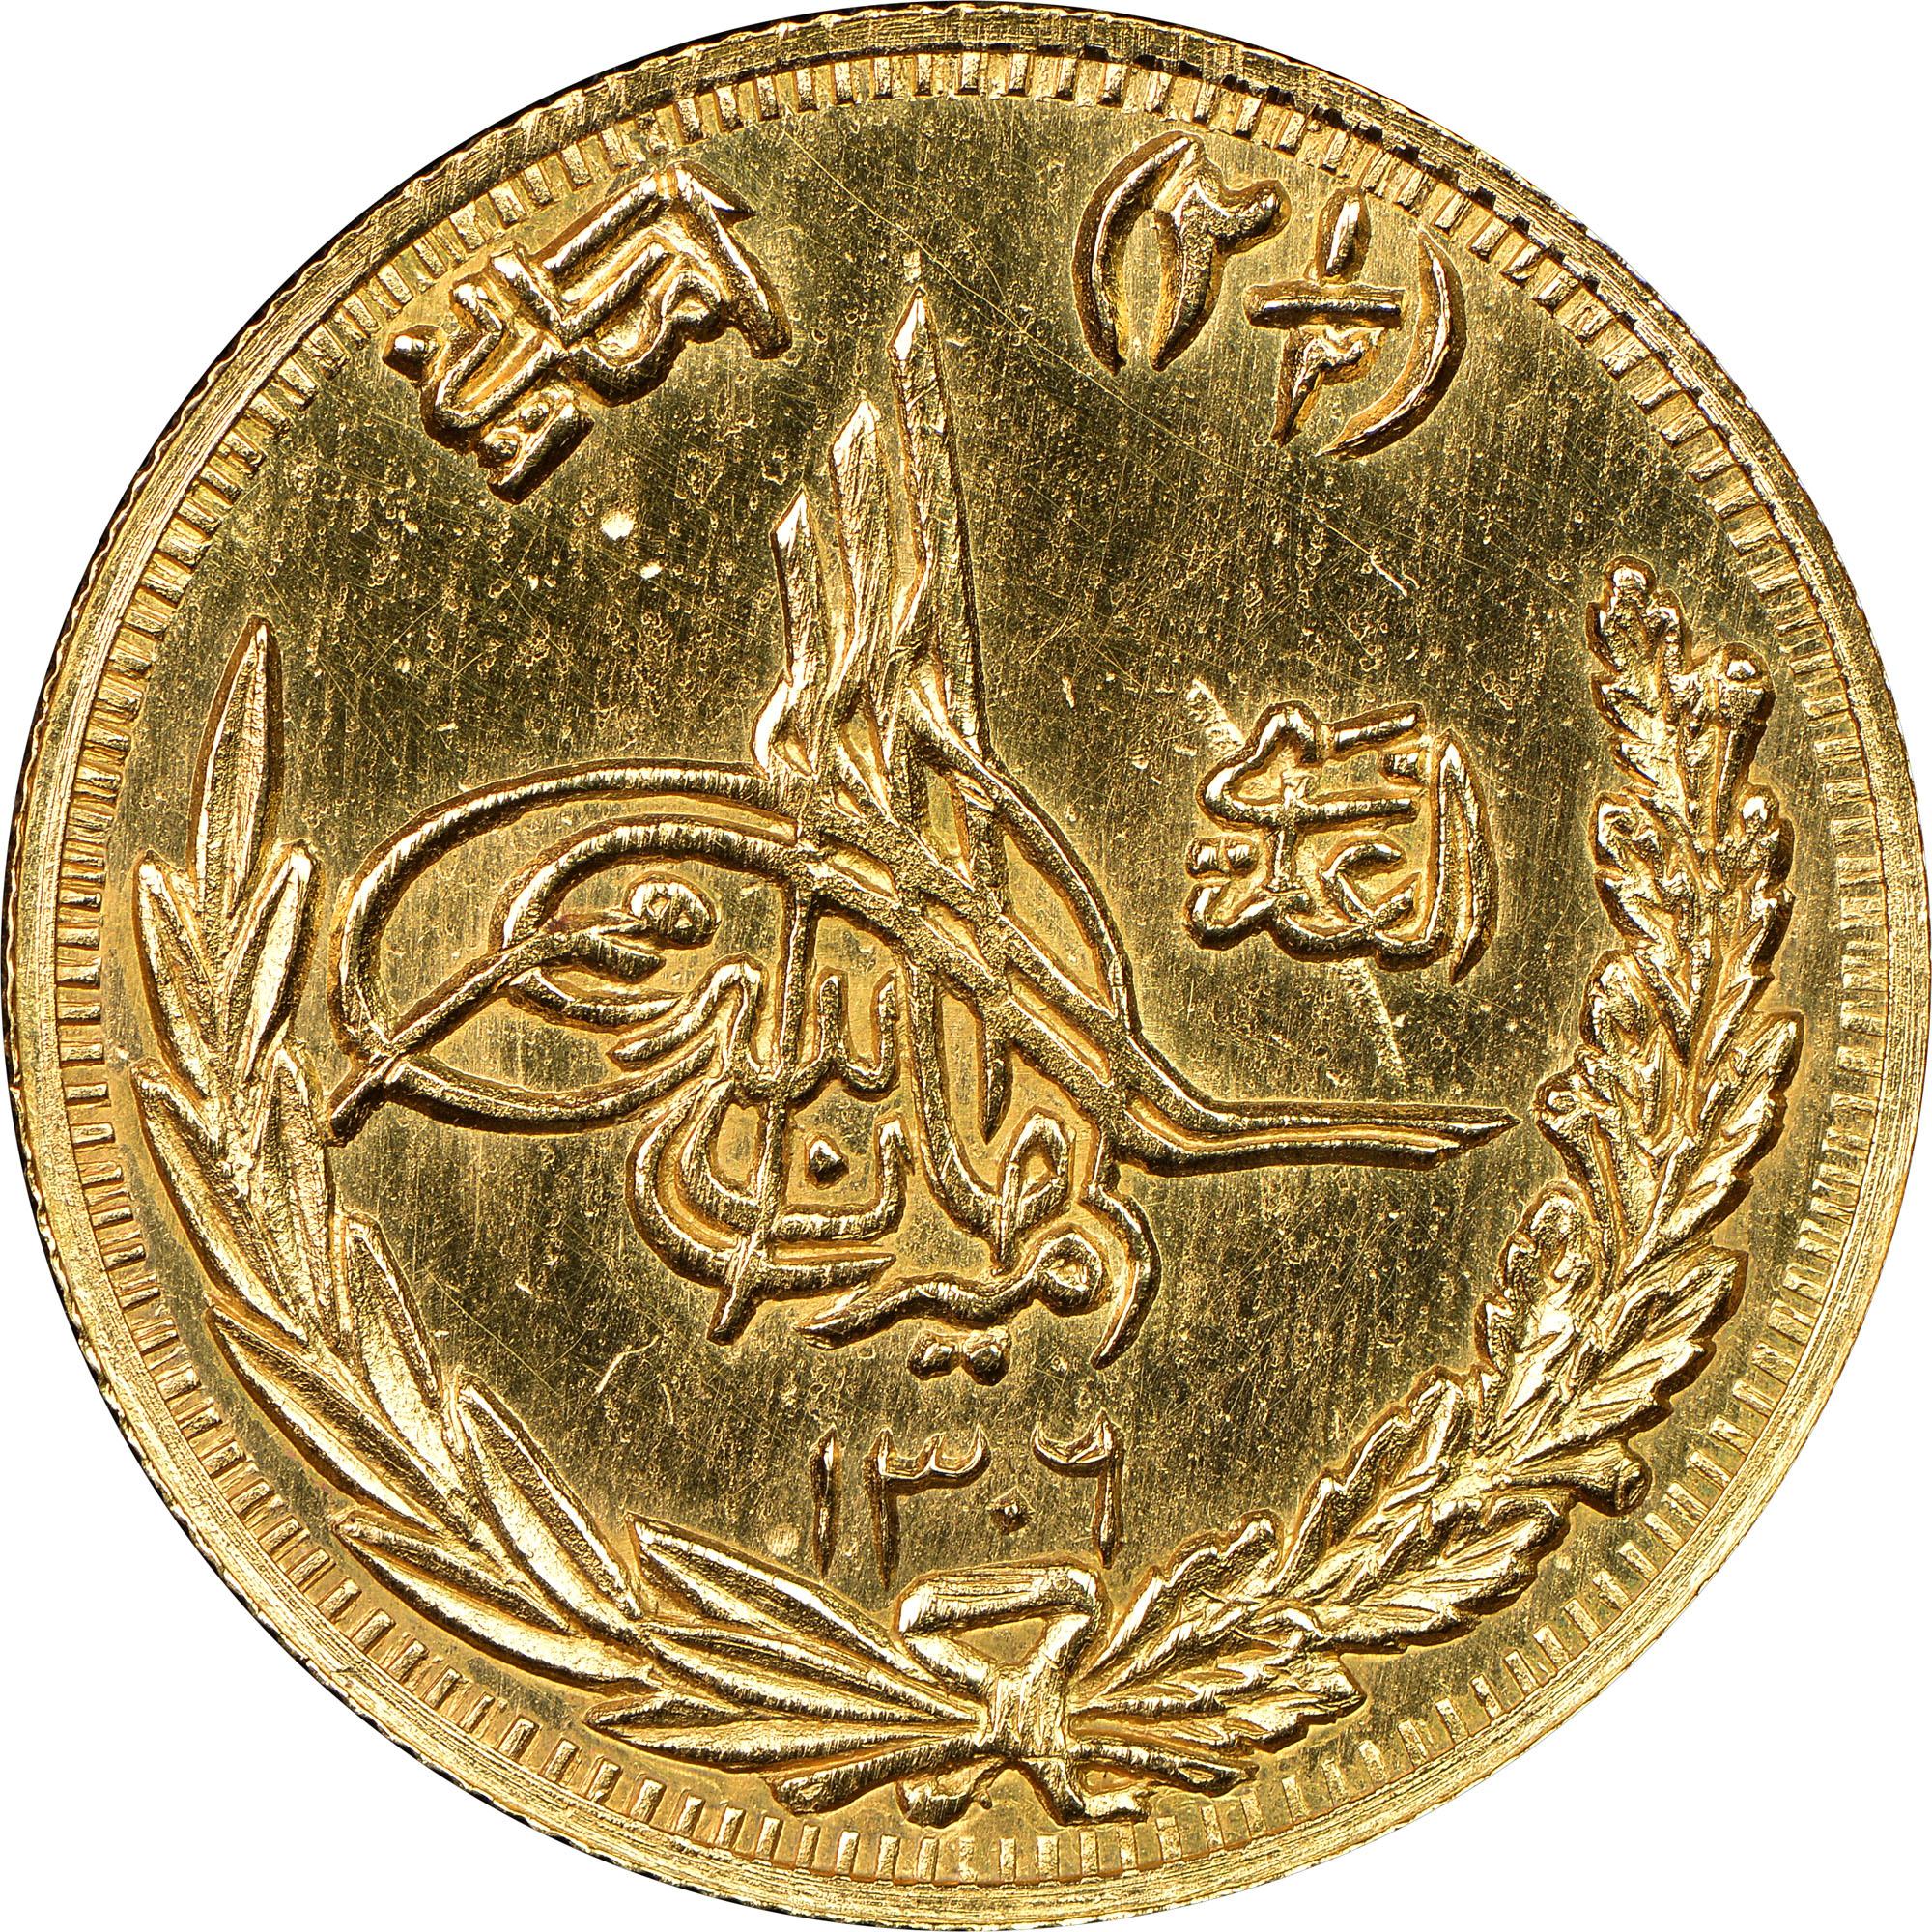 1306/9 (1927) Afghanistan 2-1/2 Amani obverse